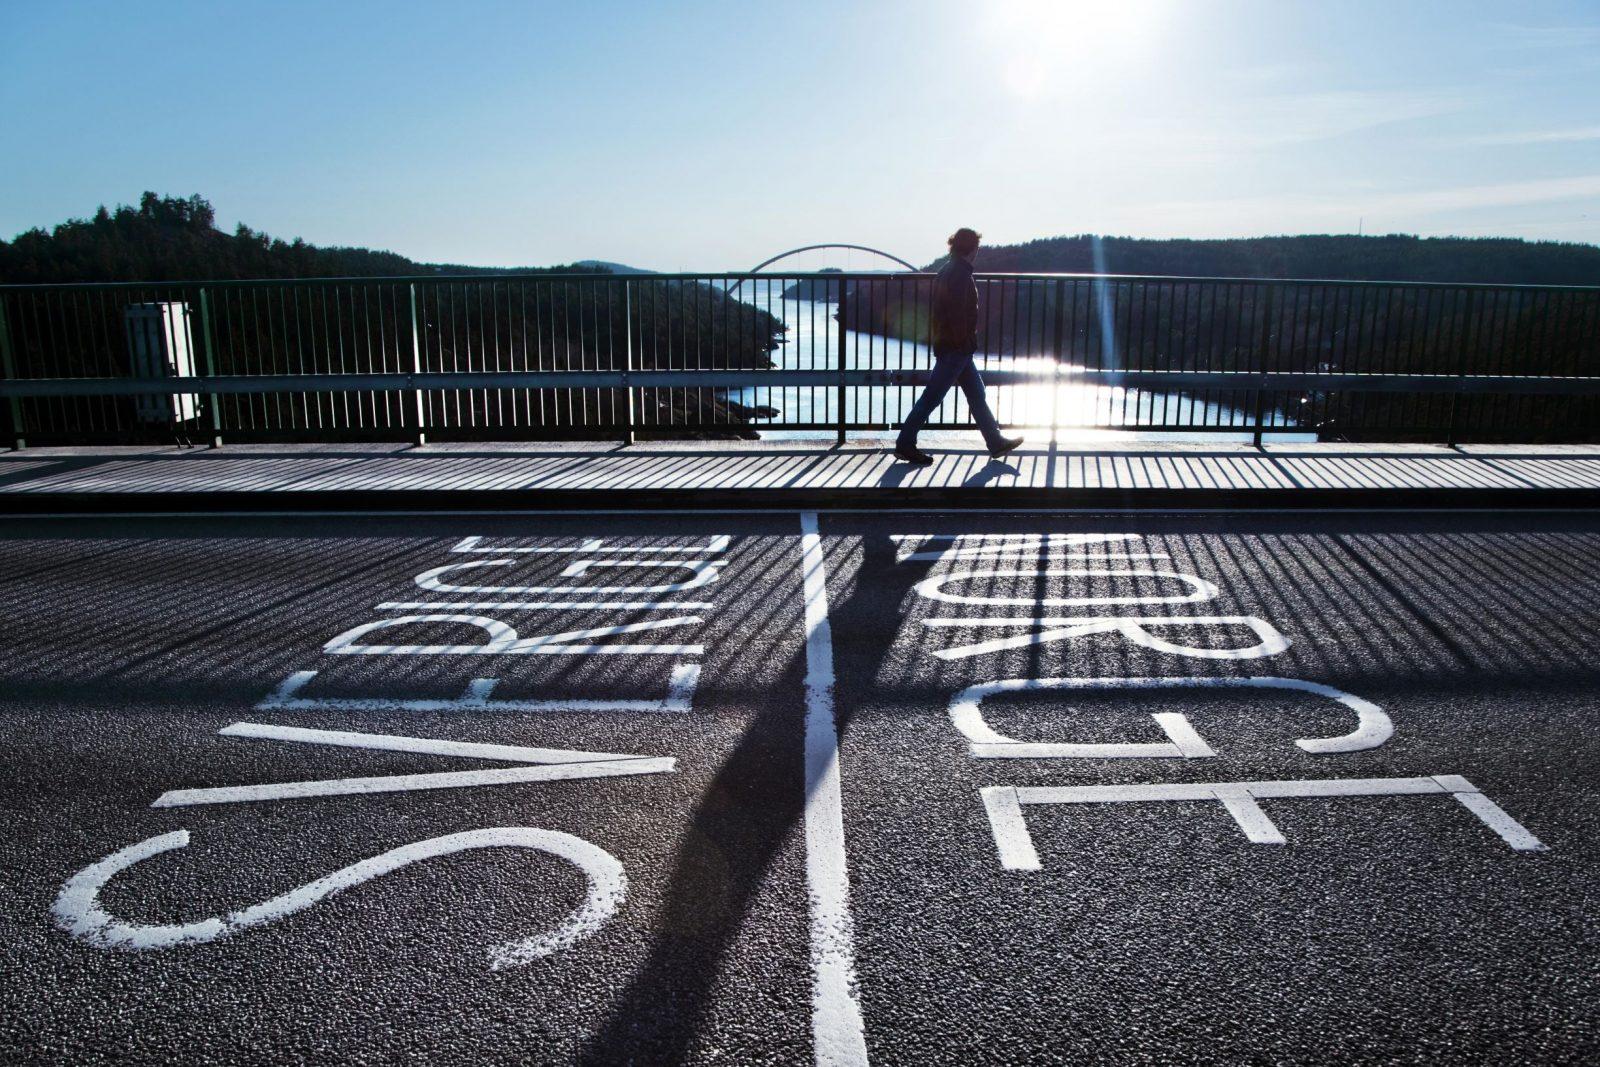 Boarder between Sweden and Norway